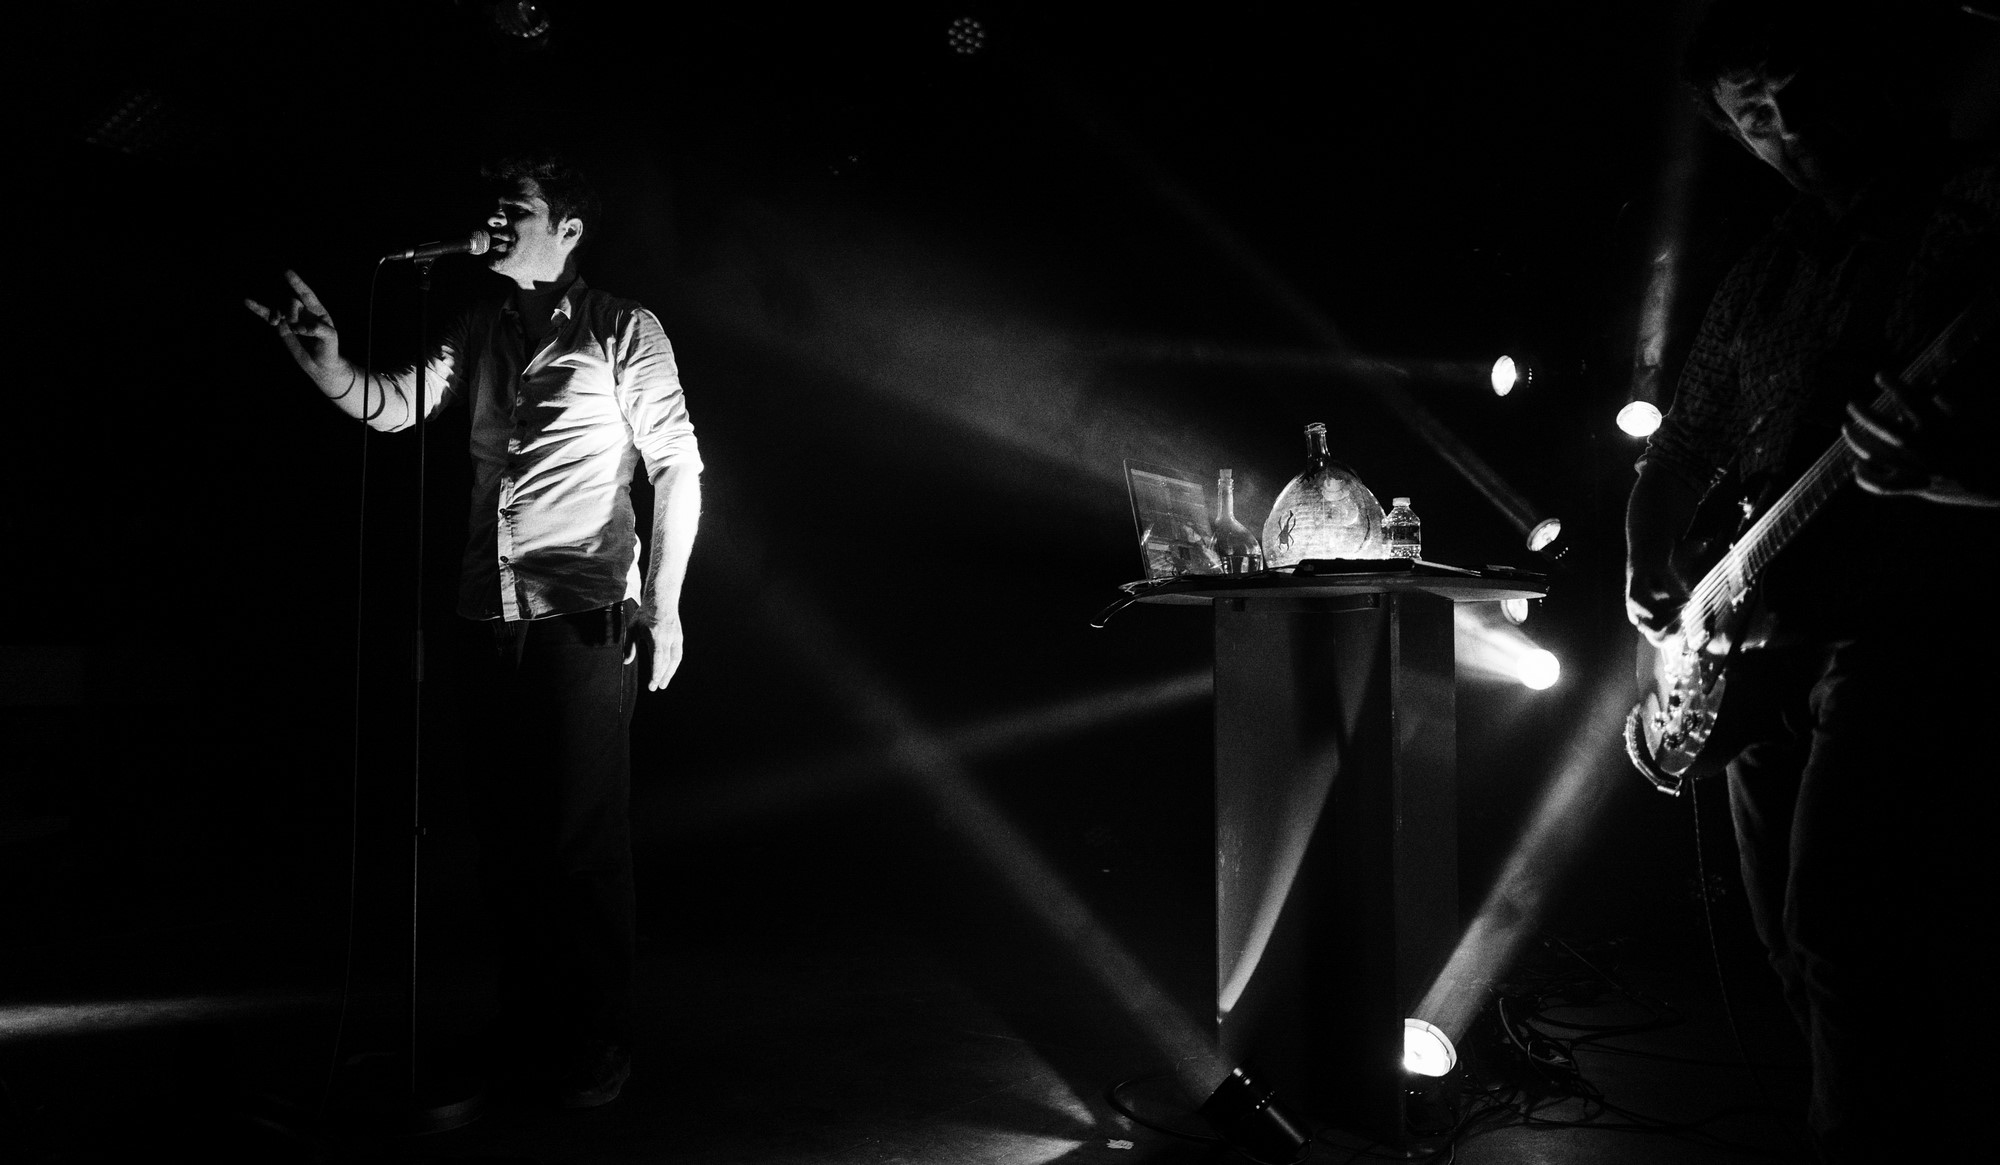 Fantazio + Totem [La Bobine] 11/03